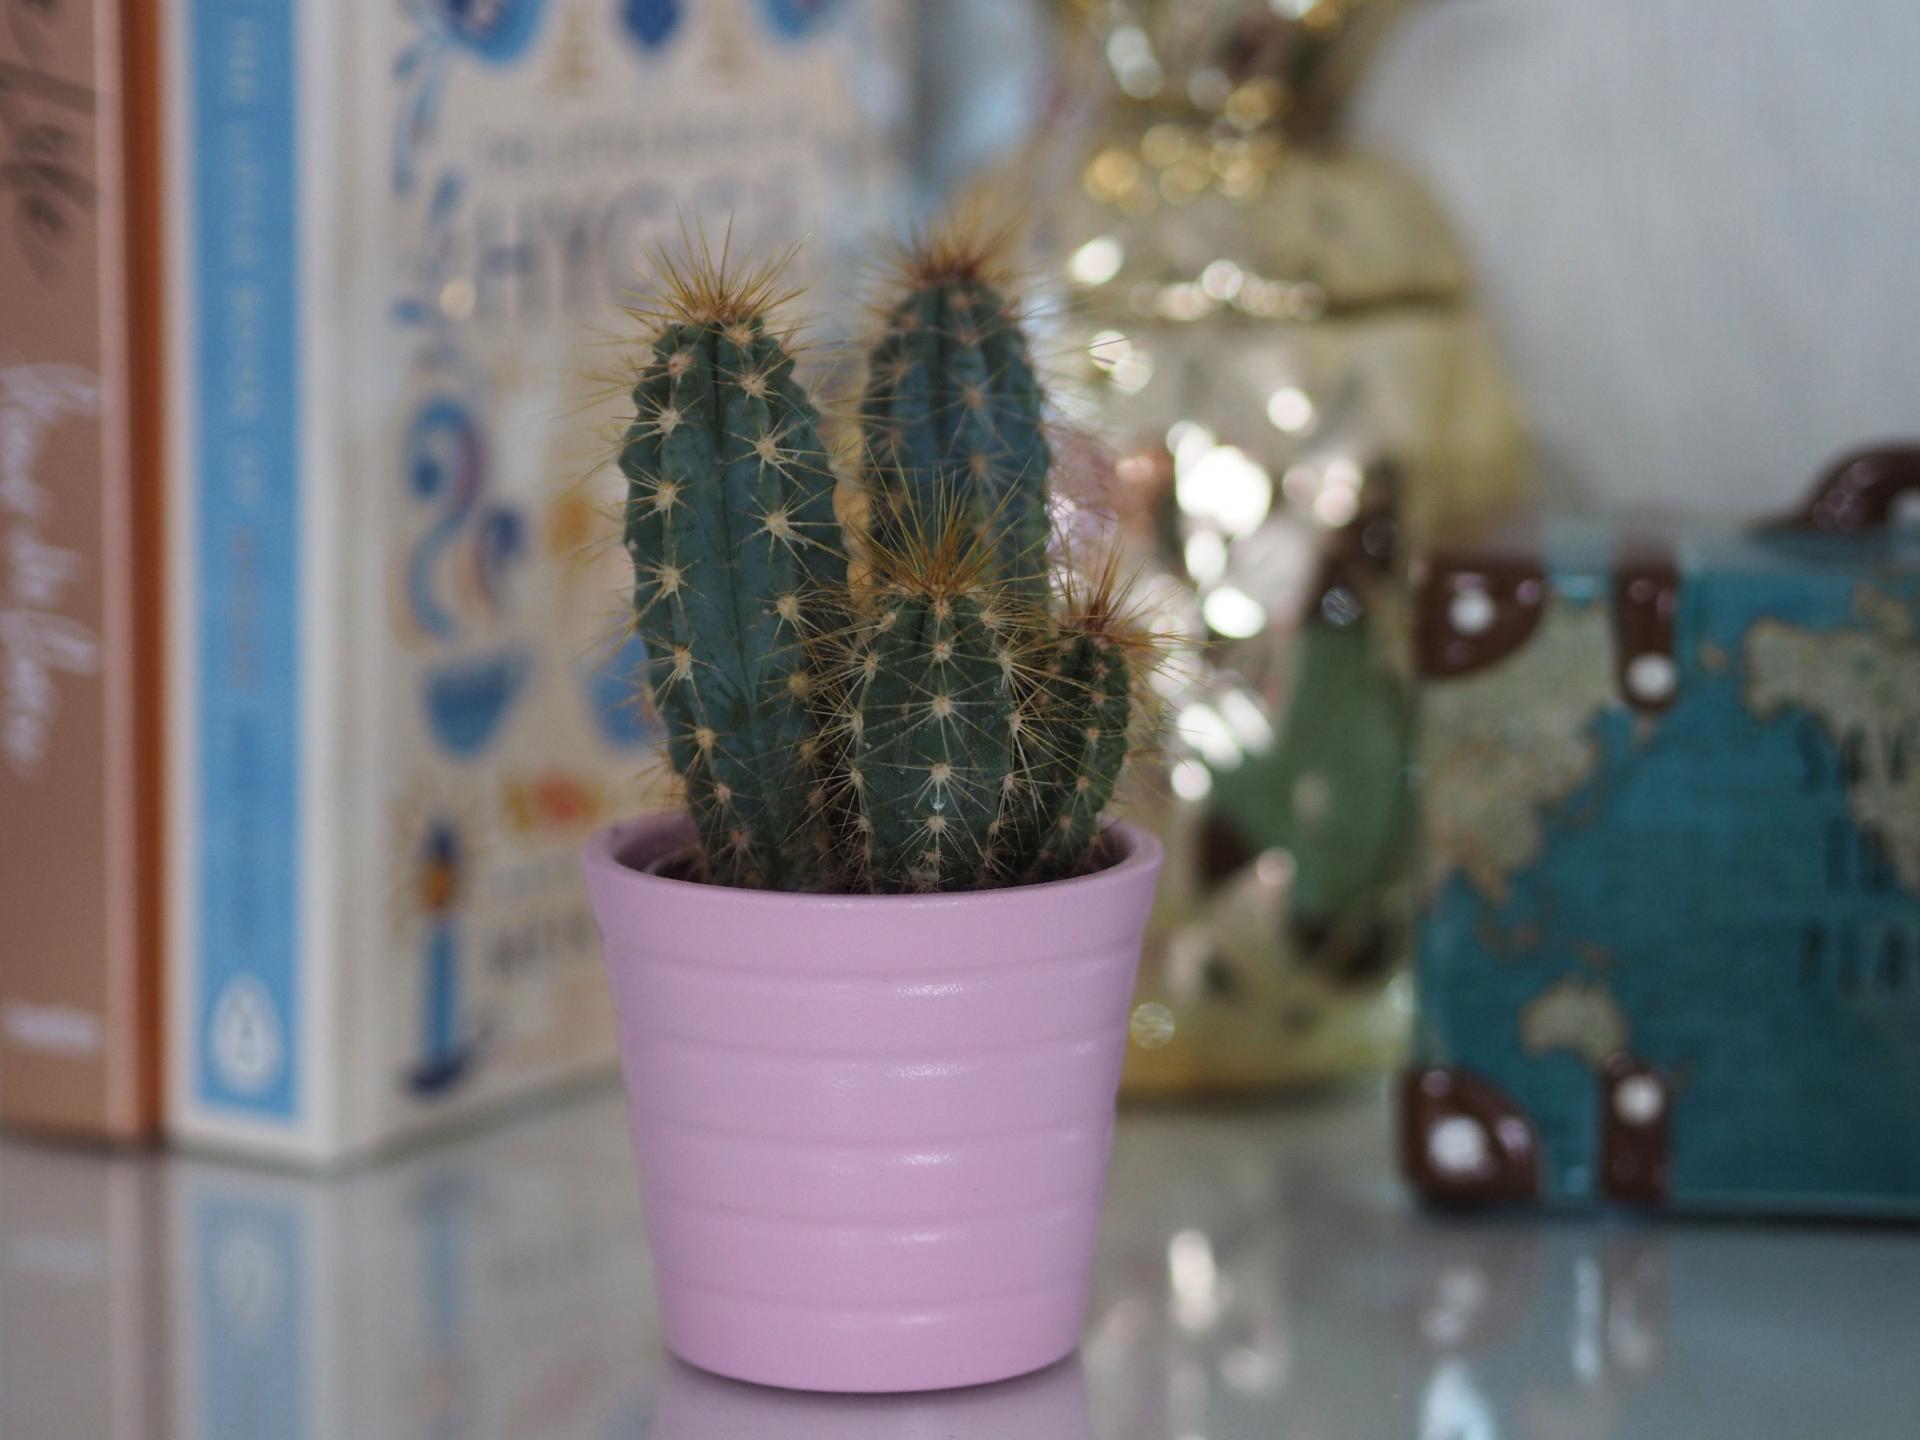 Inspiration for Gifts for Her, Make-Up Brushes - Rachel Nicole UK Blogger